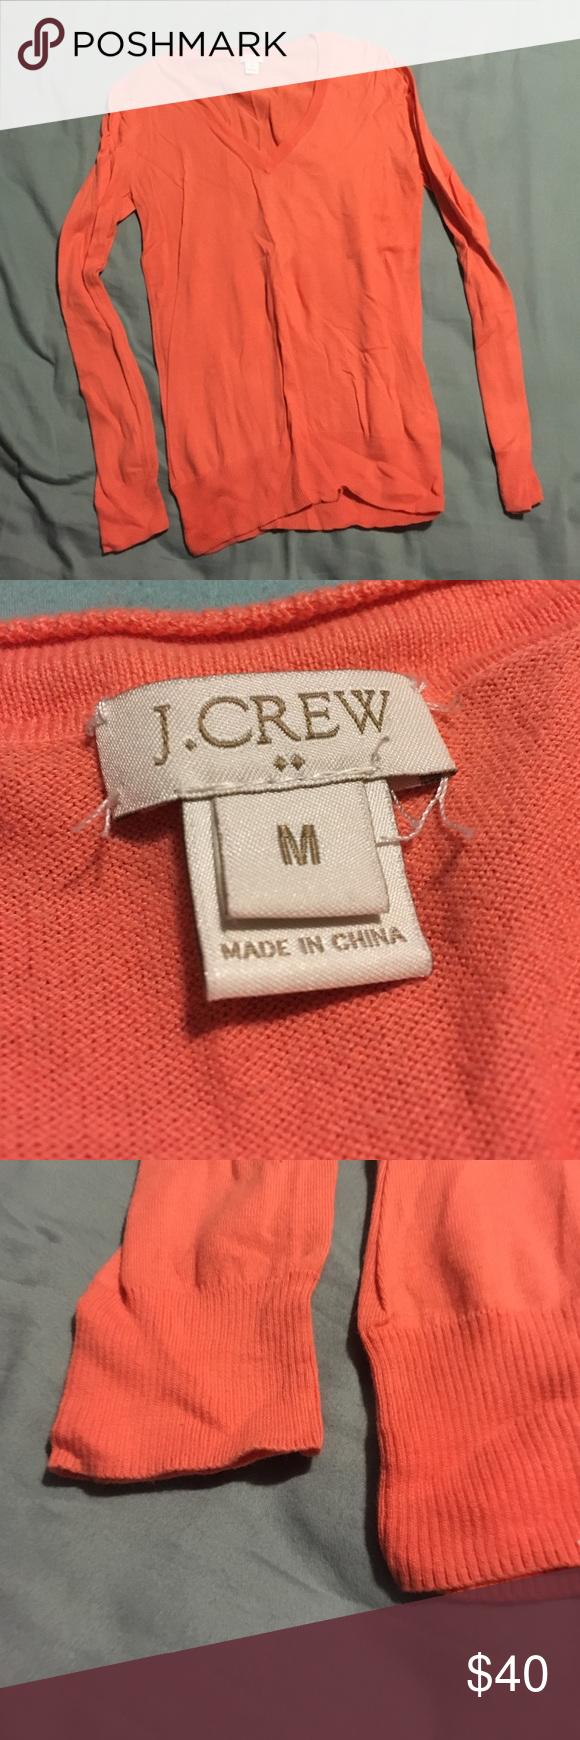 Jcrew Sweater Jcrew women's Pullover sweater, v neck, medium, peach, worn once. J. Crew Tops Sweatshirts & Hoodies